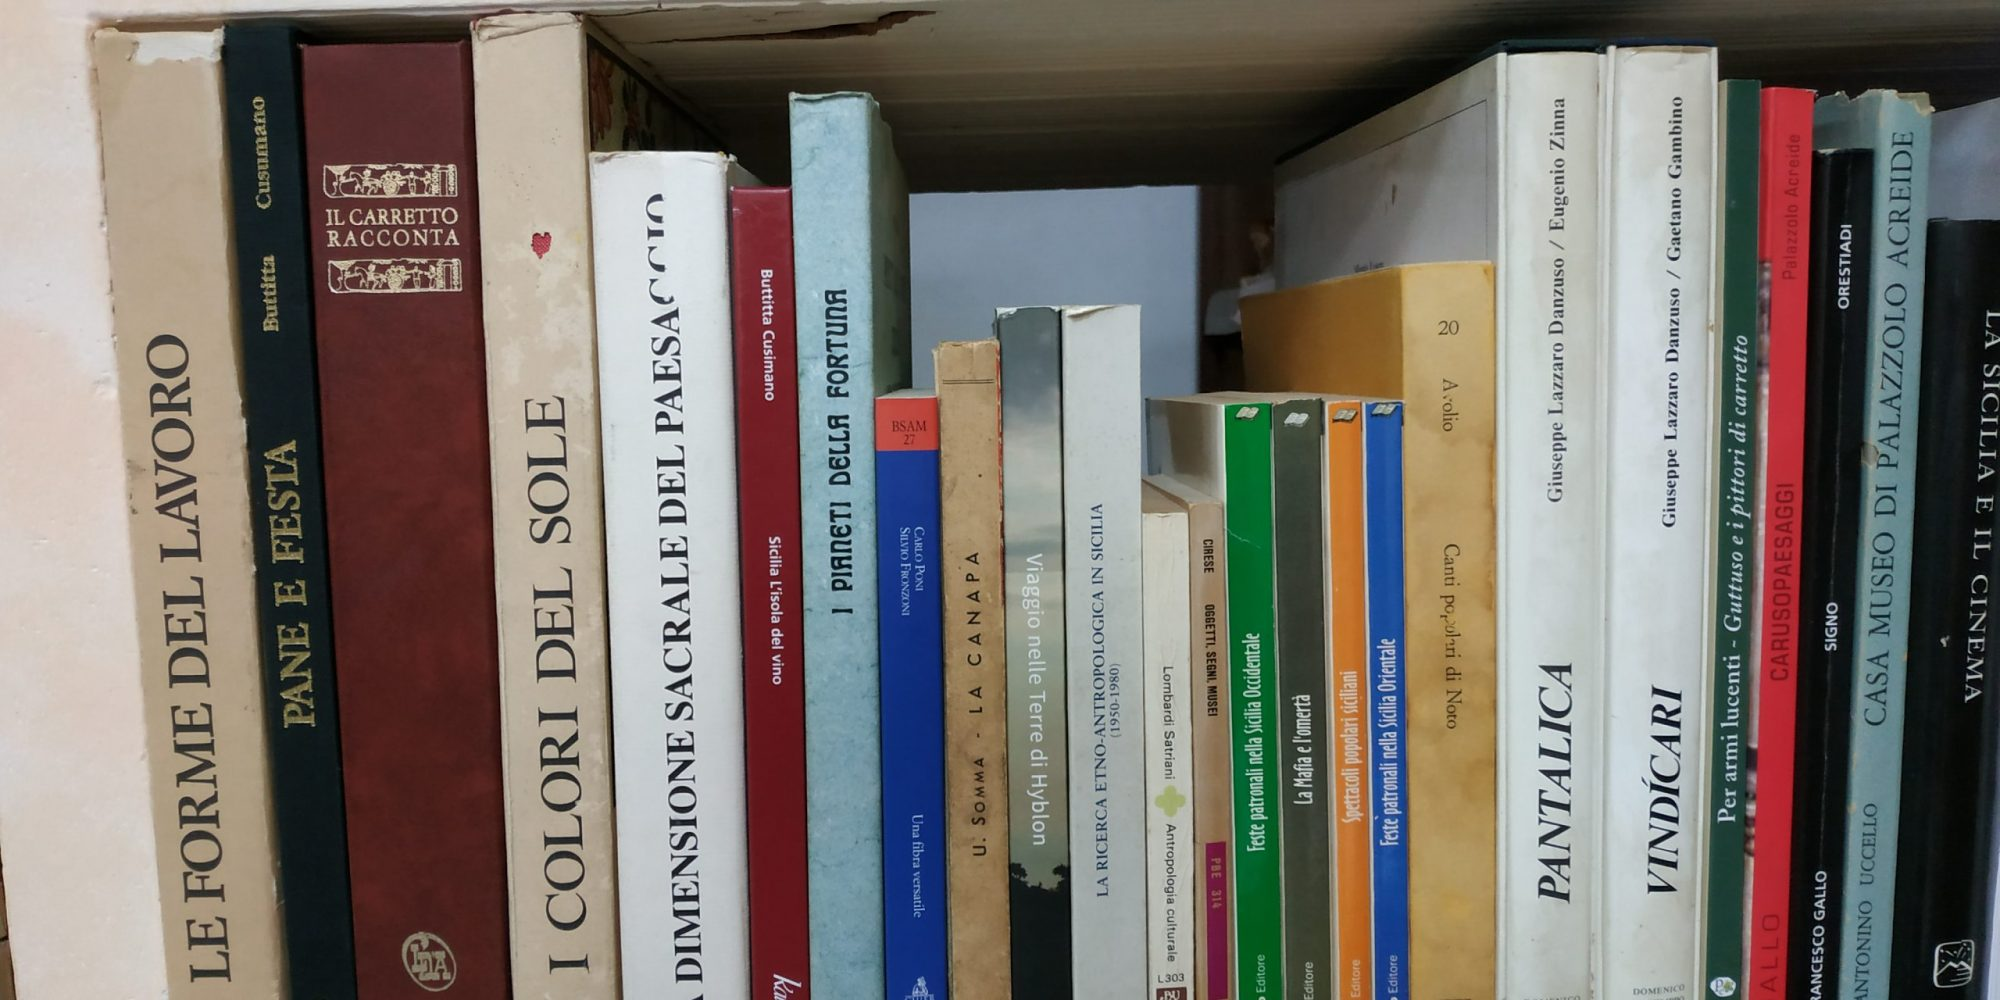 biblioteca centro studi iblei 04